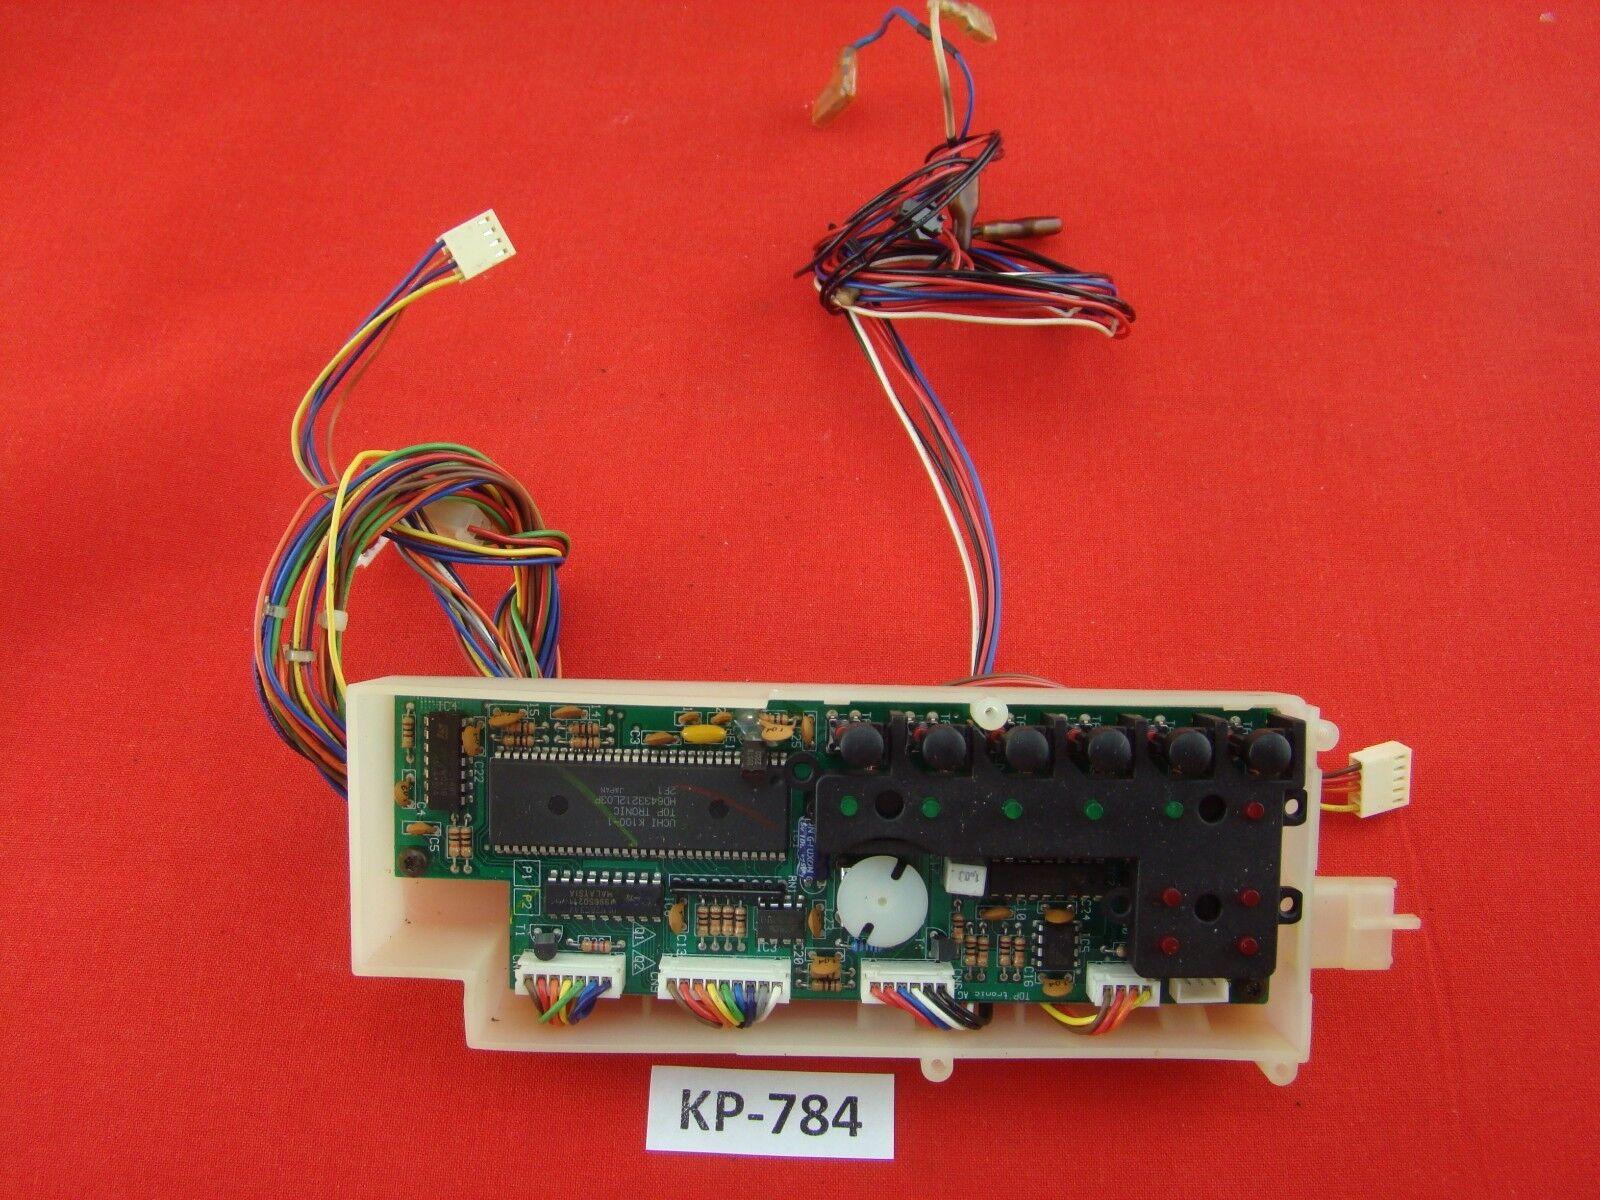 ORIGINAL Krups Type 860 bedienungspanel steuerelement  kp-784